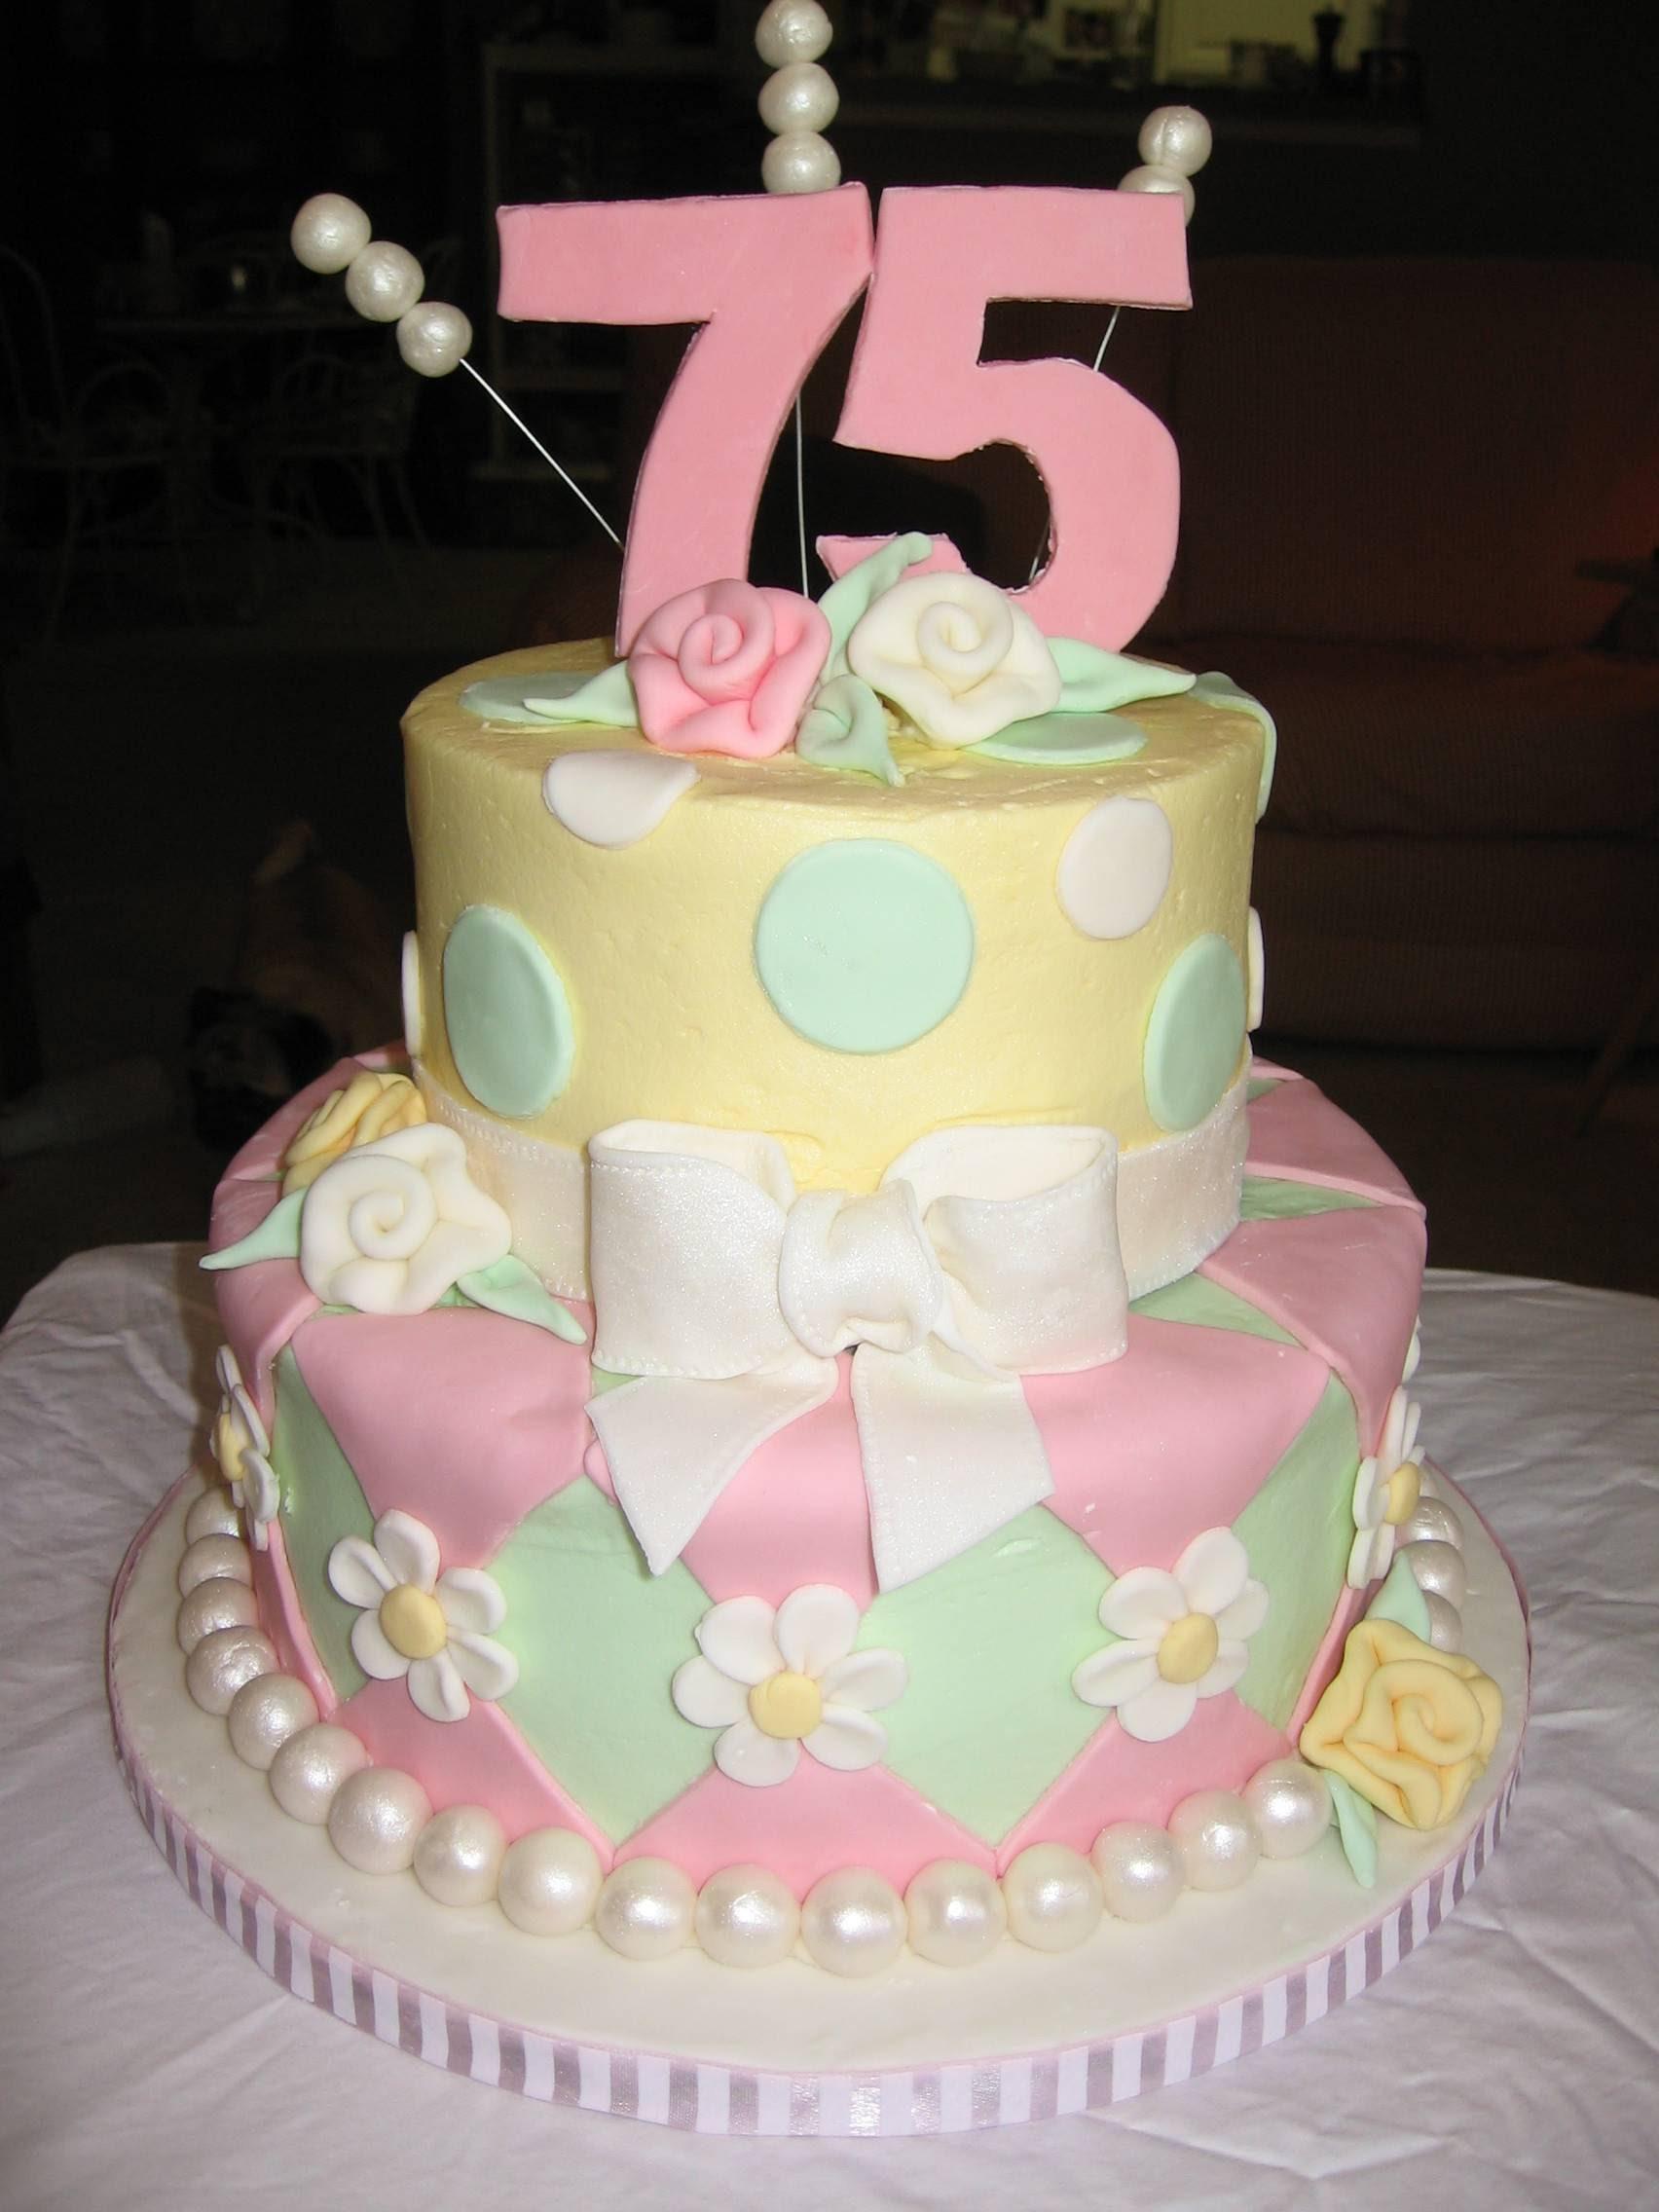 75th Birthday Cakes  75Th Birthday Cakes